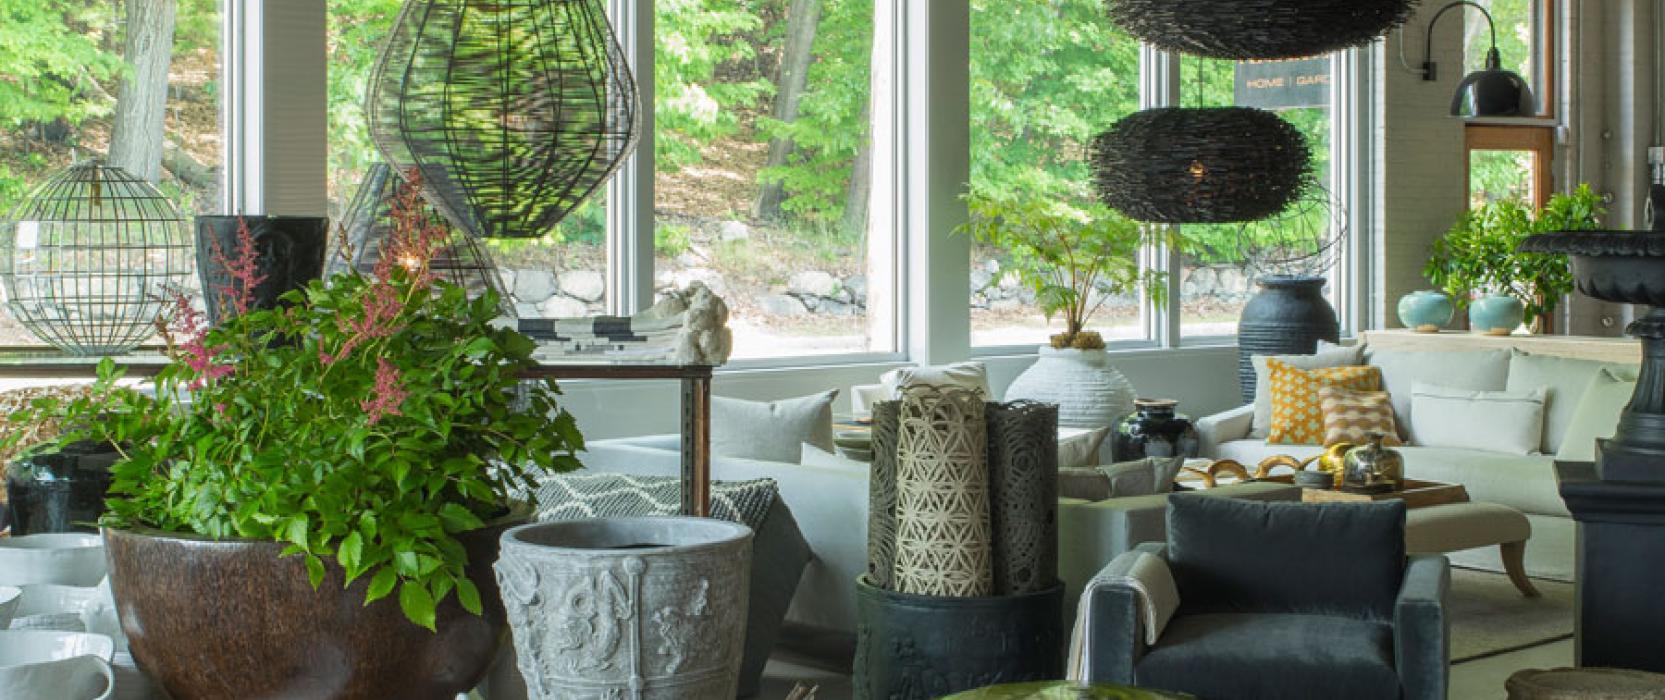 Fall Events at Artefact Home| Garden